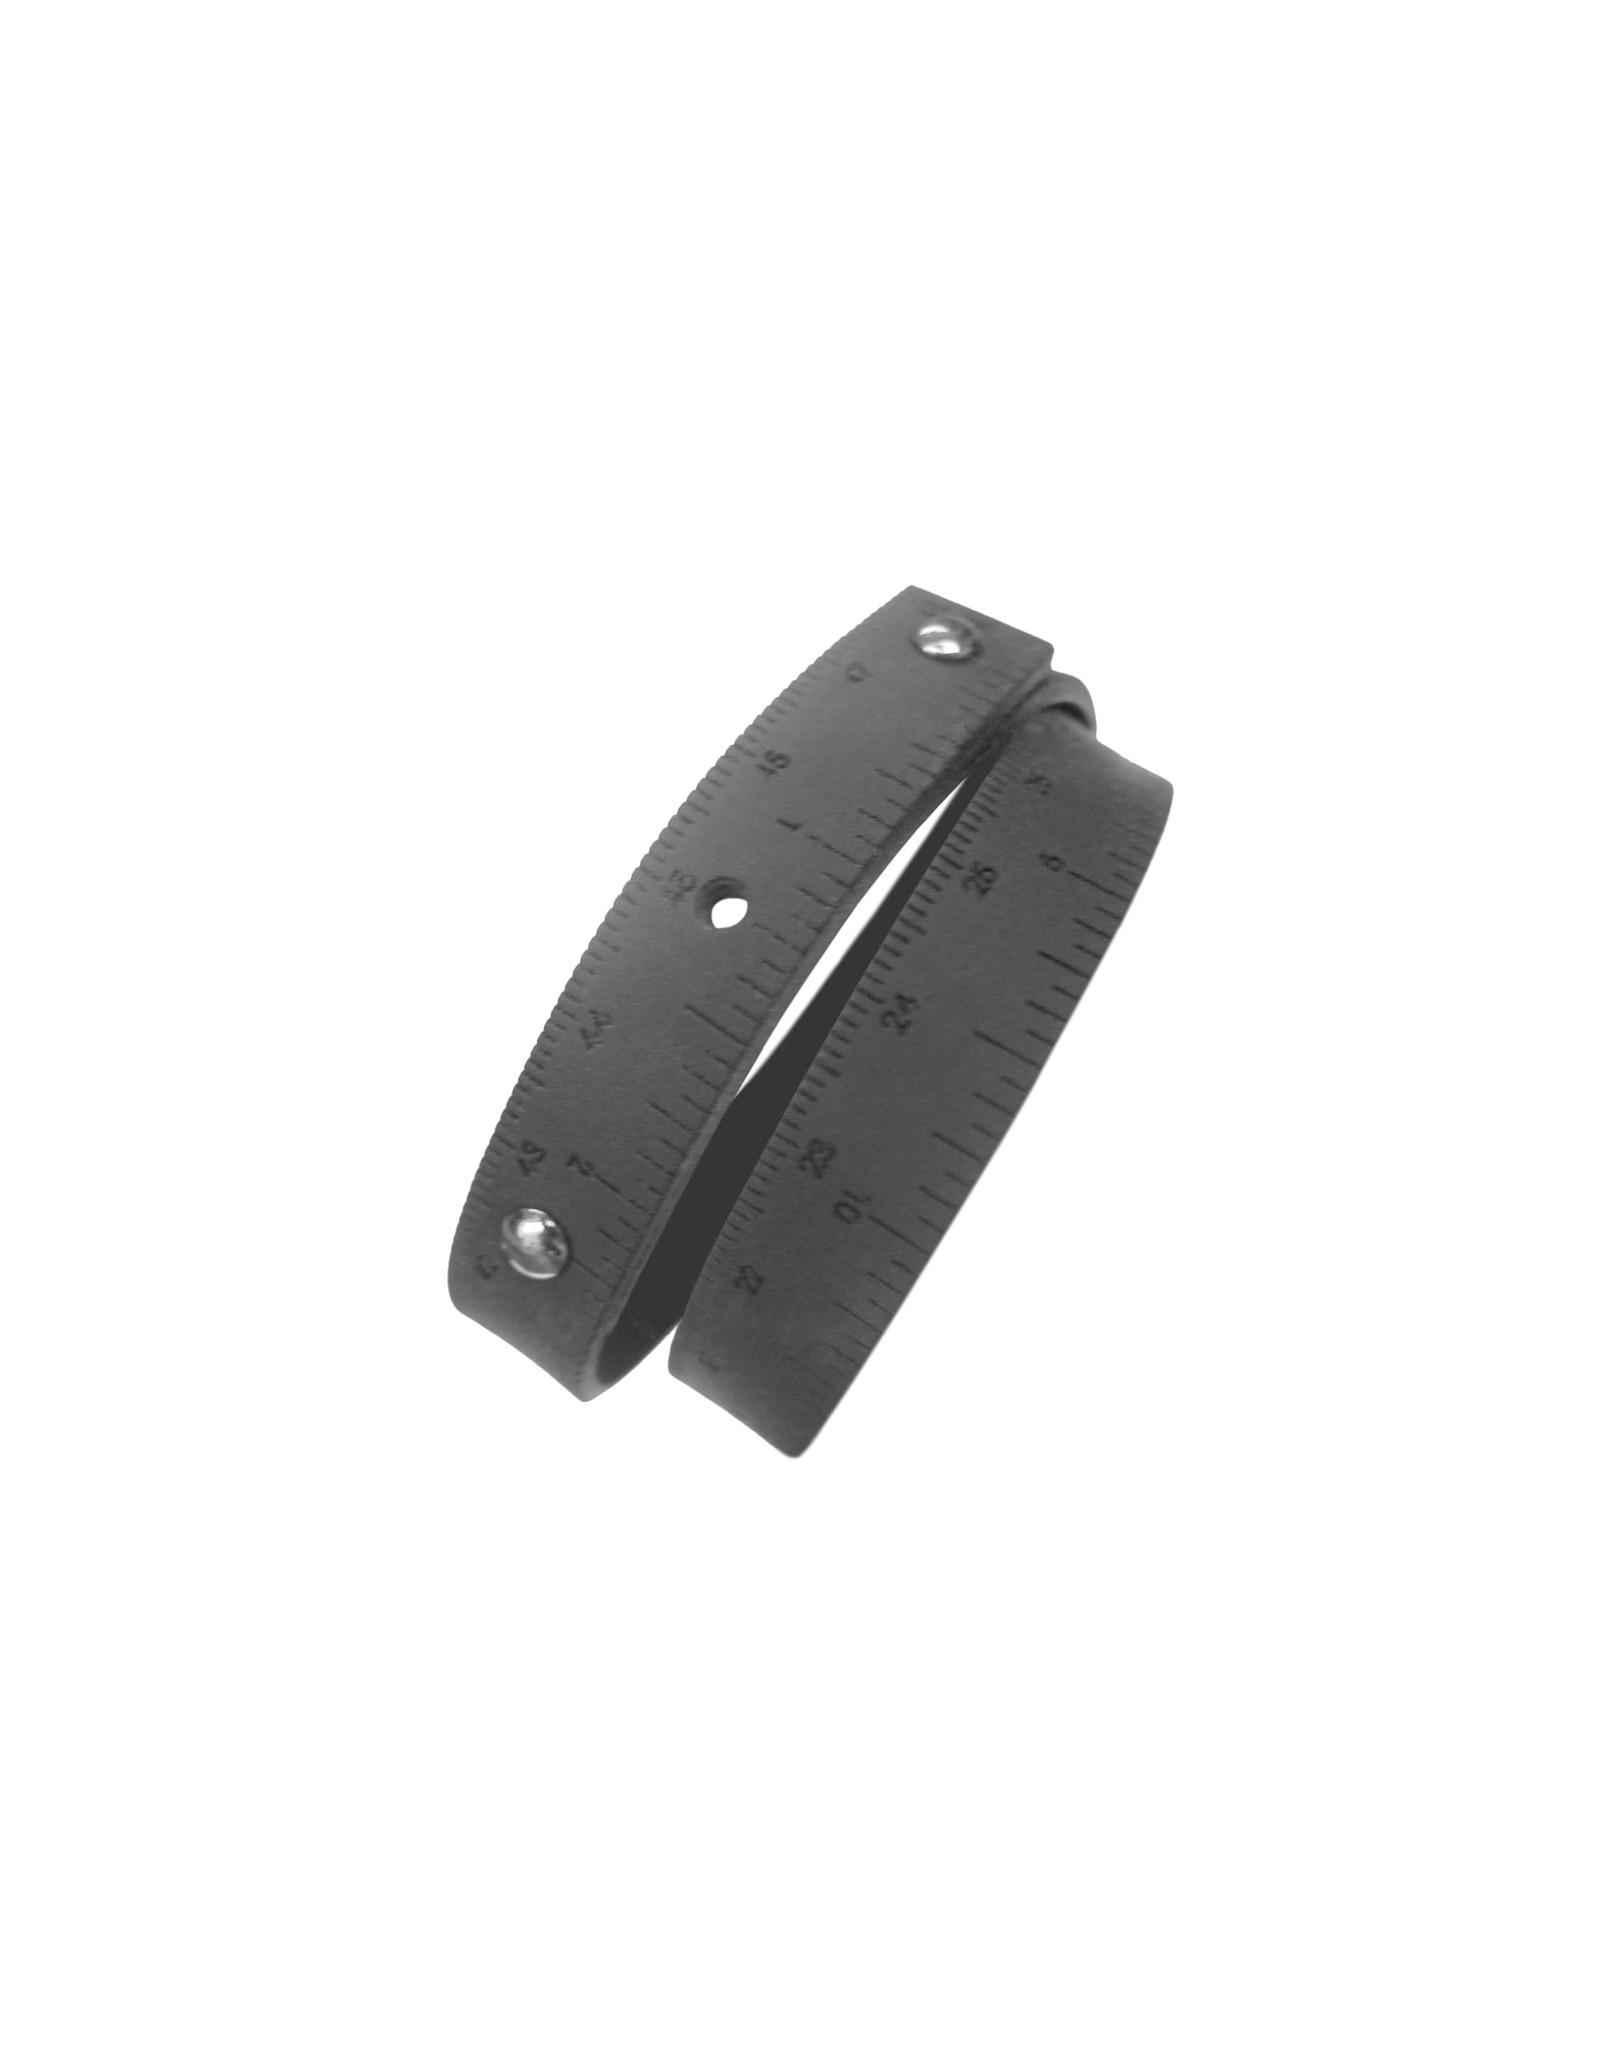 Wrist Ruler - SILICONE - BLACK